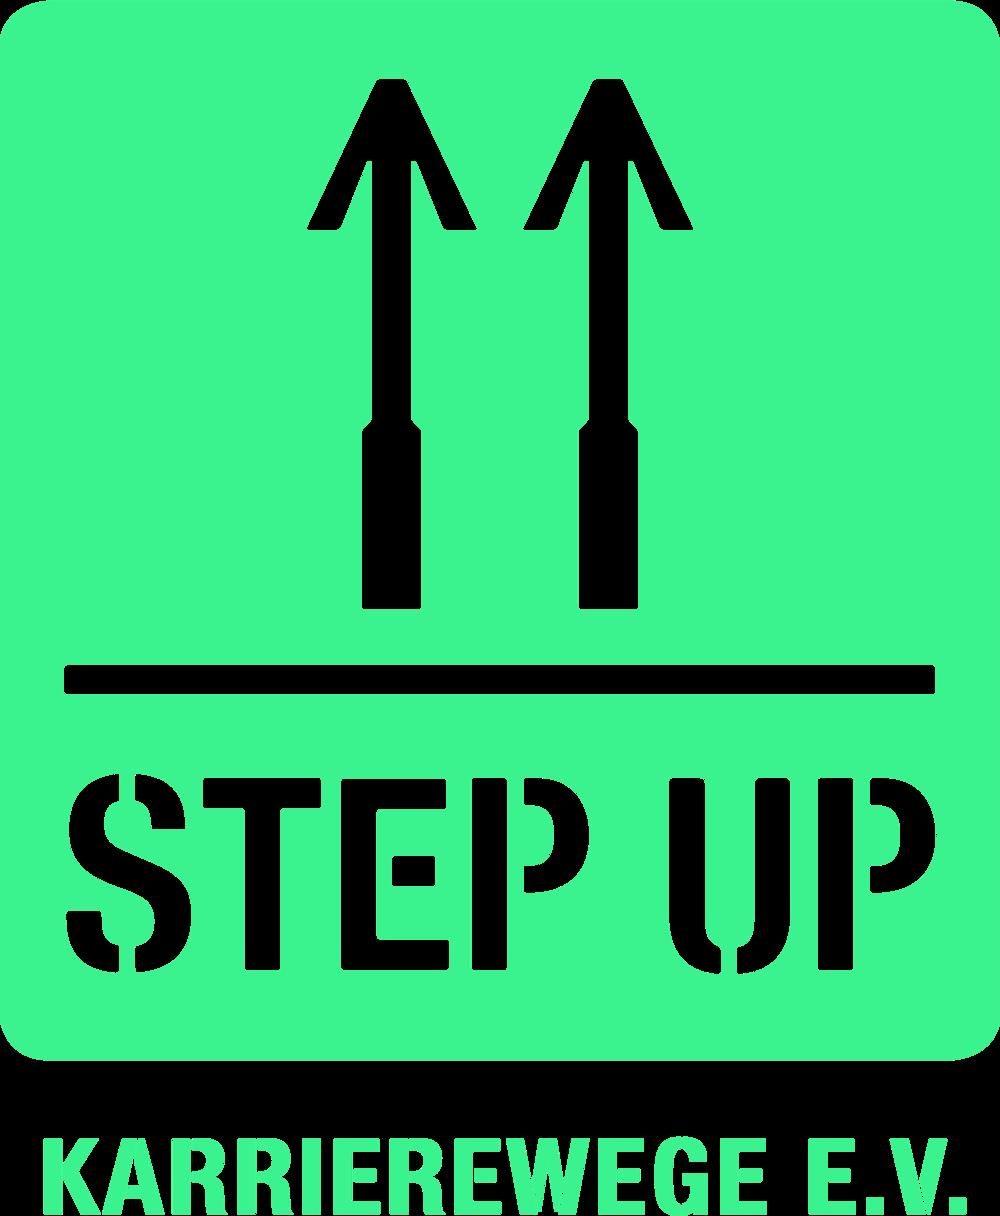 stepup-logo-neonmint-2000px.png